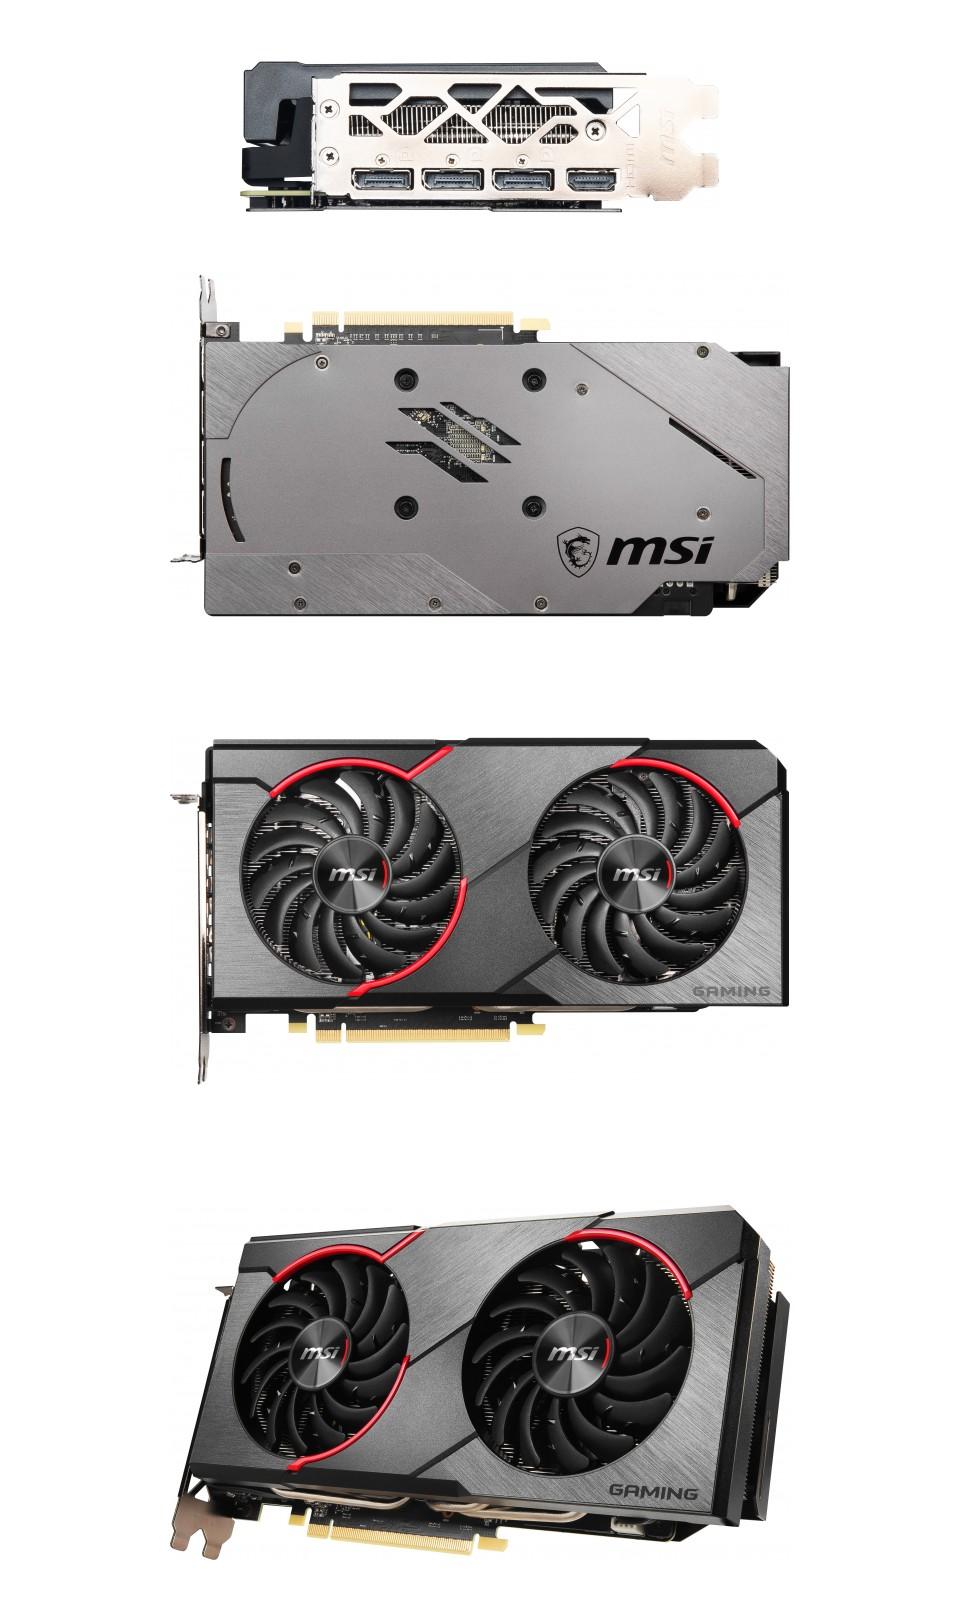 MSI Radeon RX 5500 XT Gaming X 8GB product